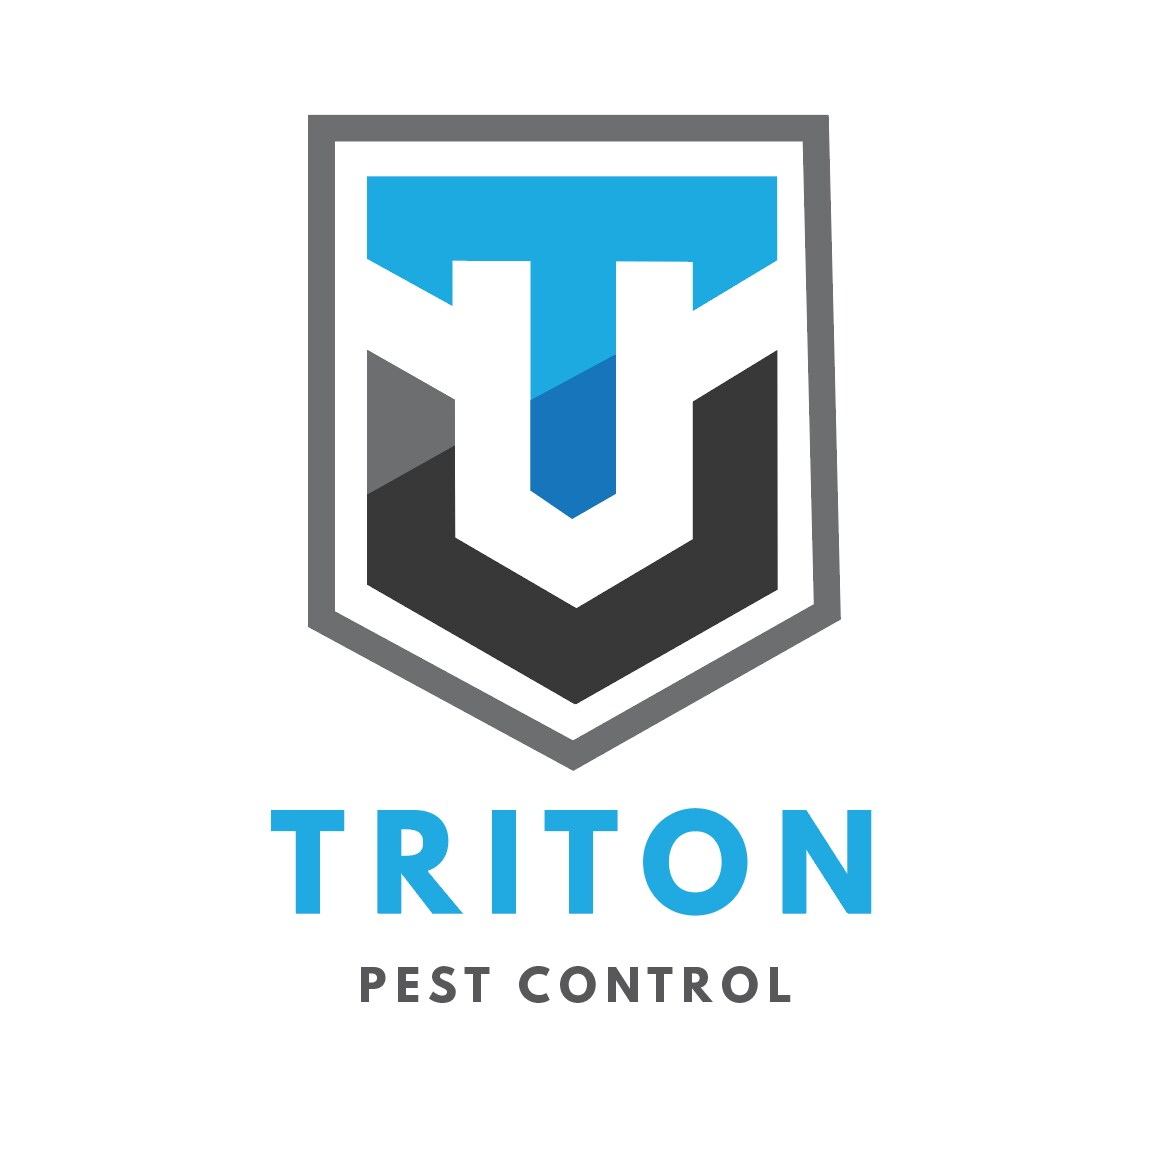 Triton Pest Control